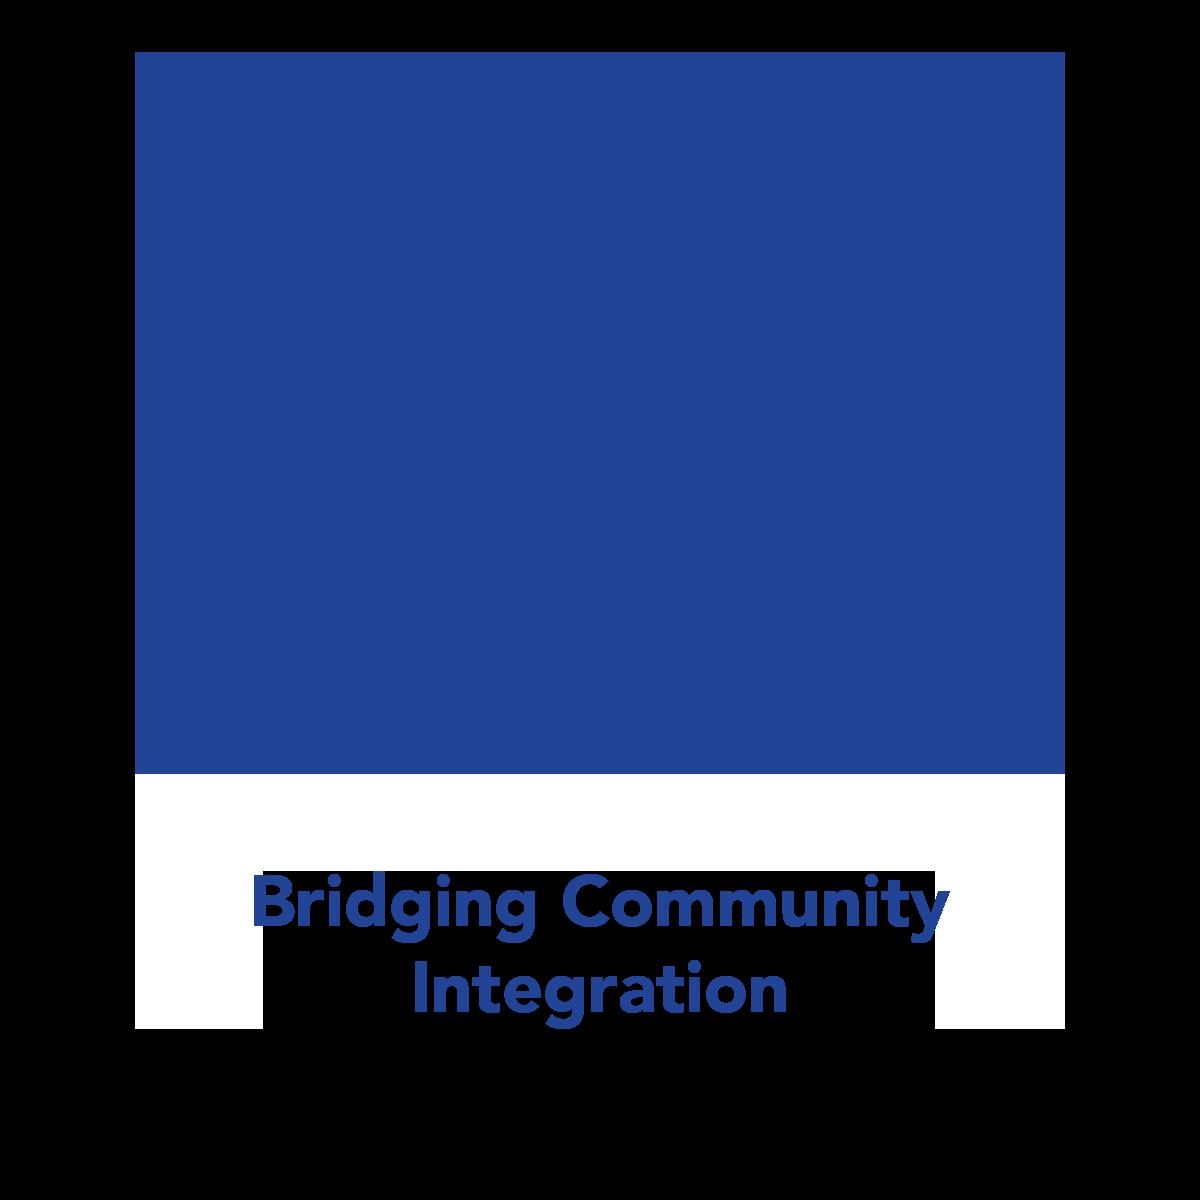 bridging-community-integration.png